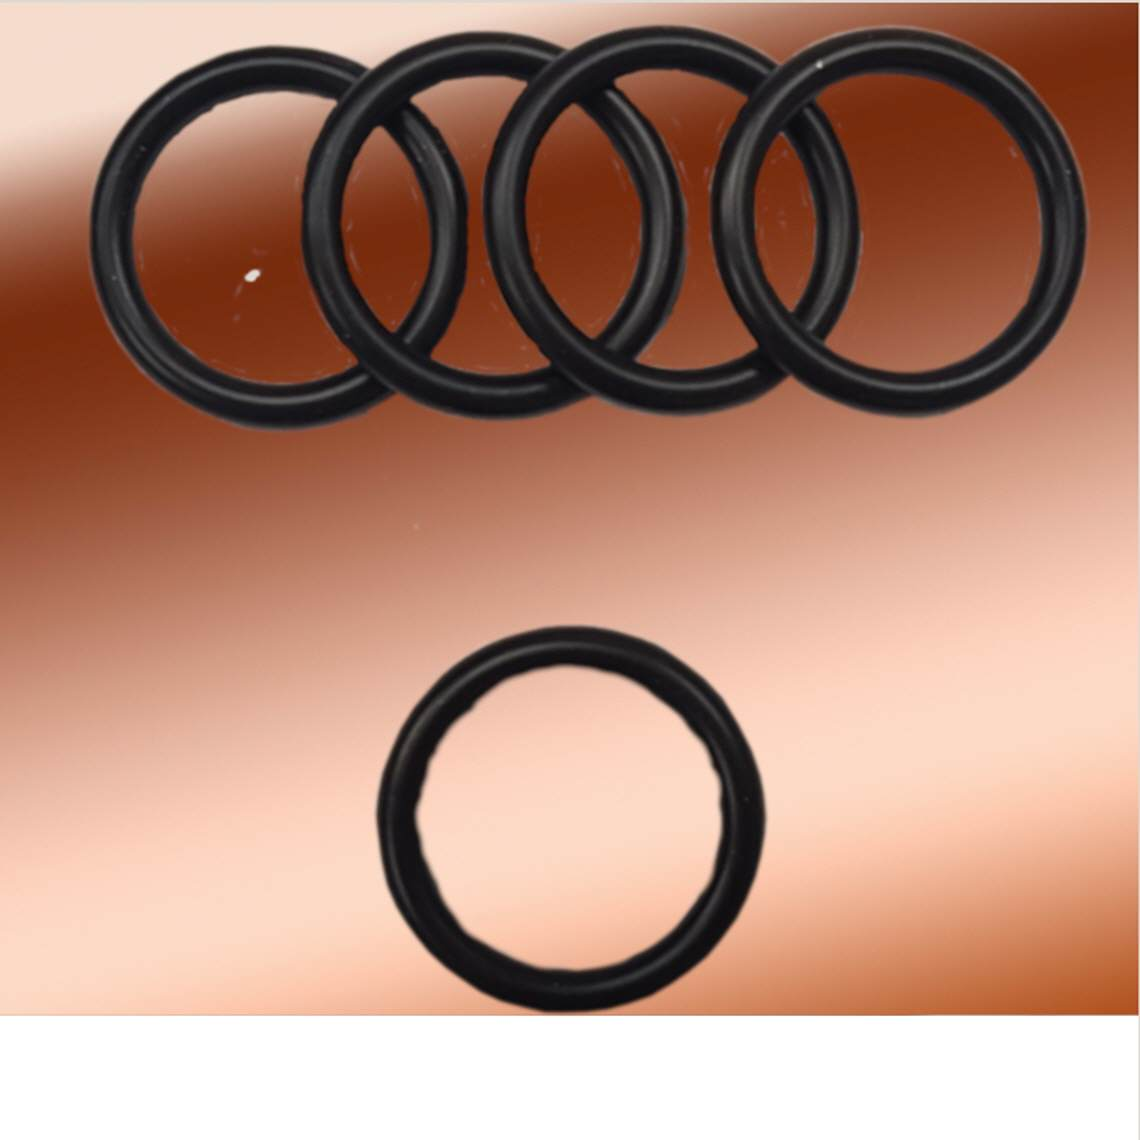 5x Buderus 7101644 O-Ring 19x3